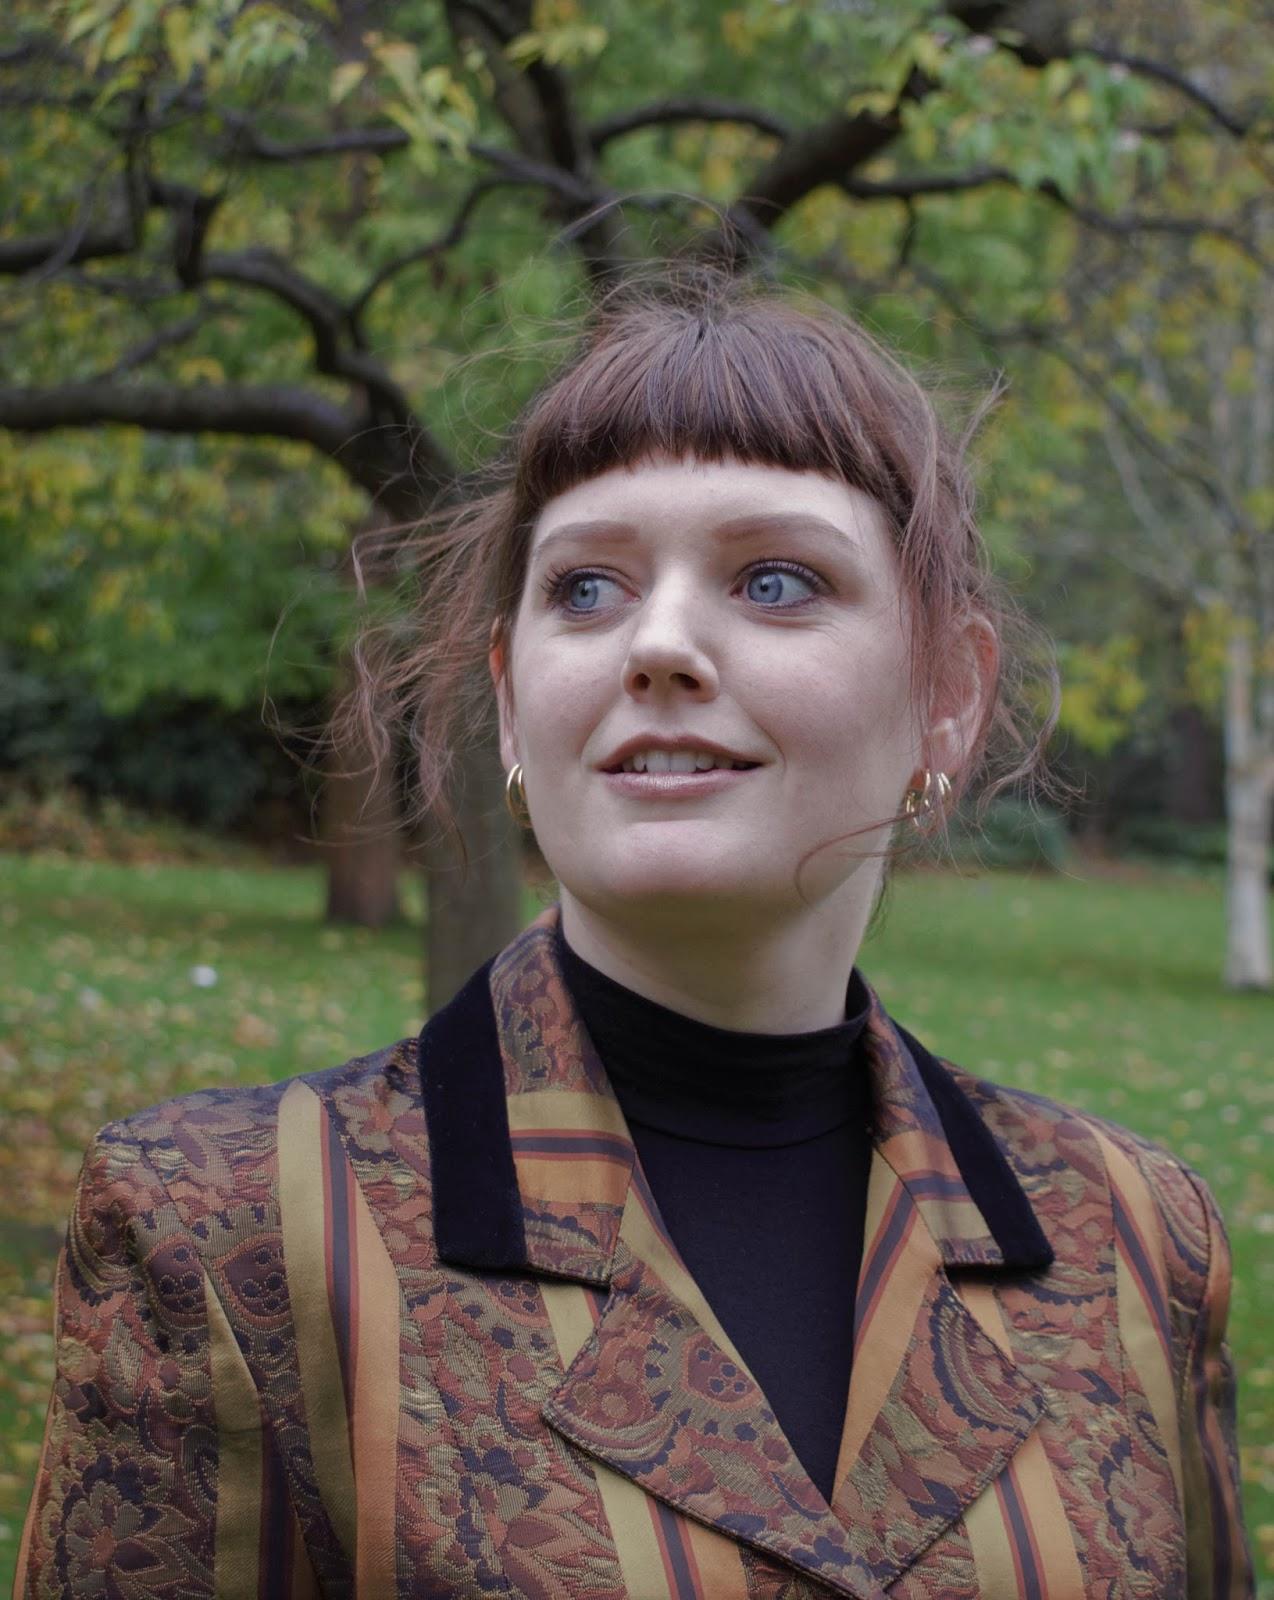 Scottish lifestyle blogger Lauren Aitchison from The Devil Wears Tartan portrait for Autumn in Princes Street Gardens